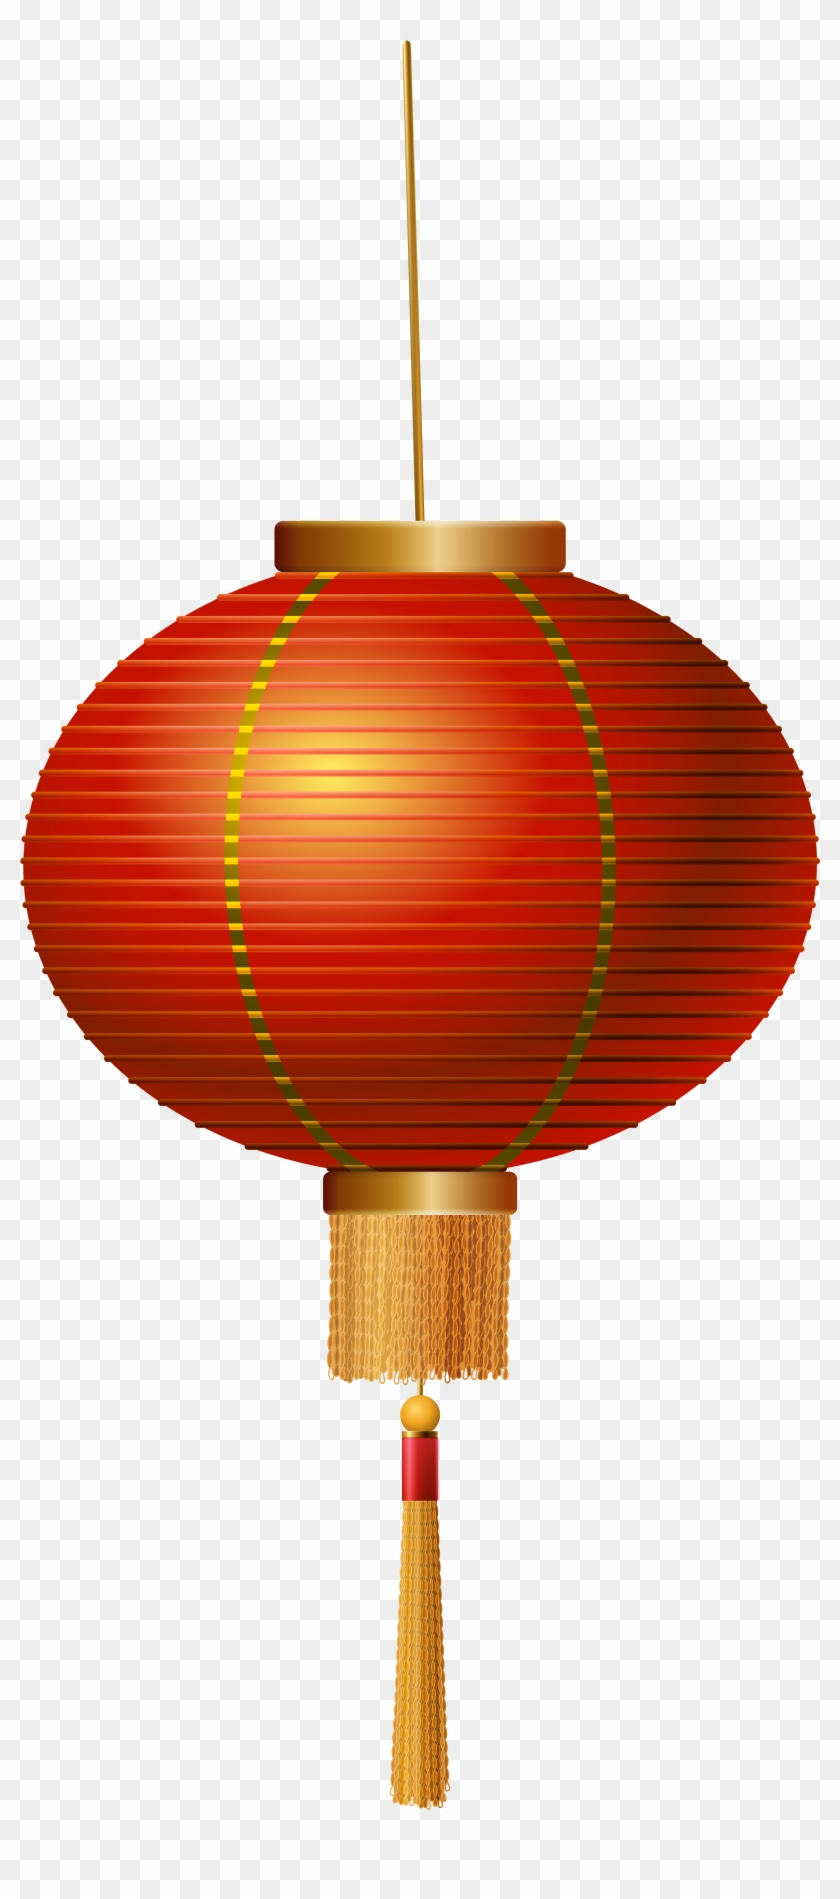 Red Chinese Lantern Png Clip Art - Chinese Lantern Png #31956